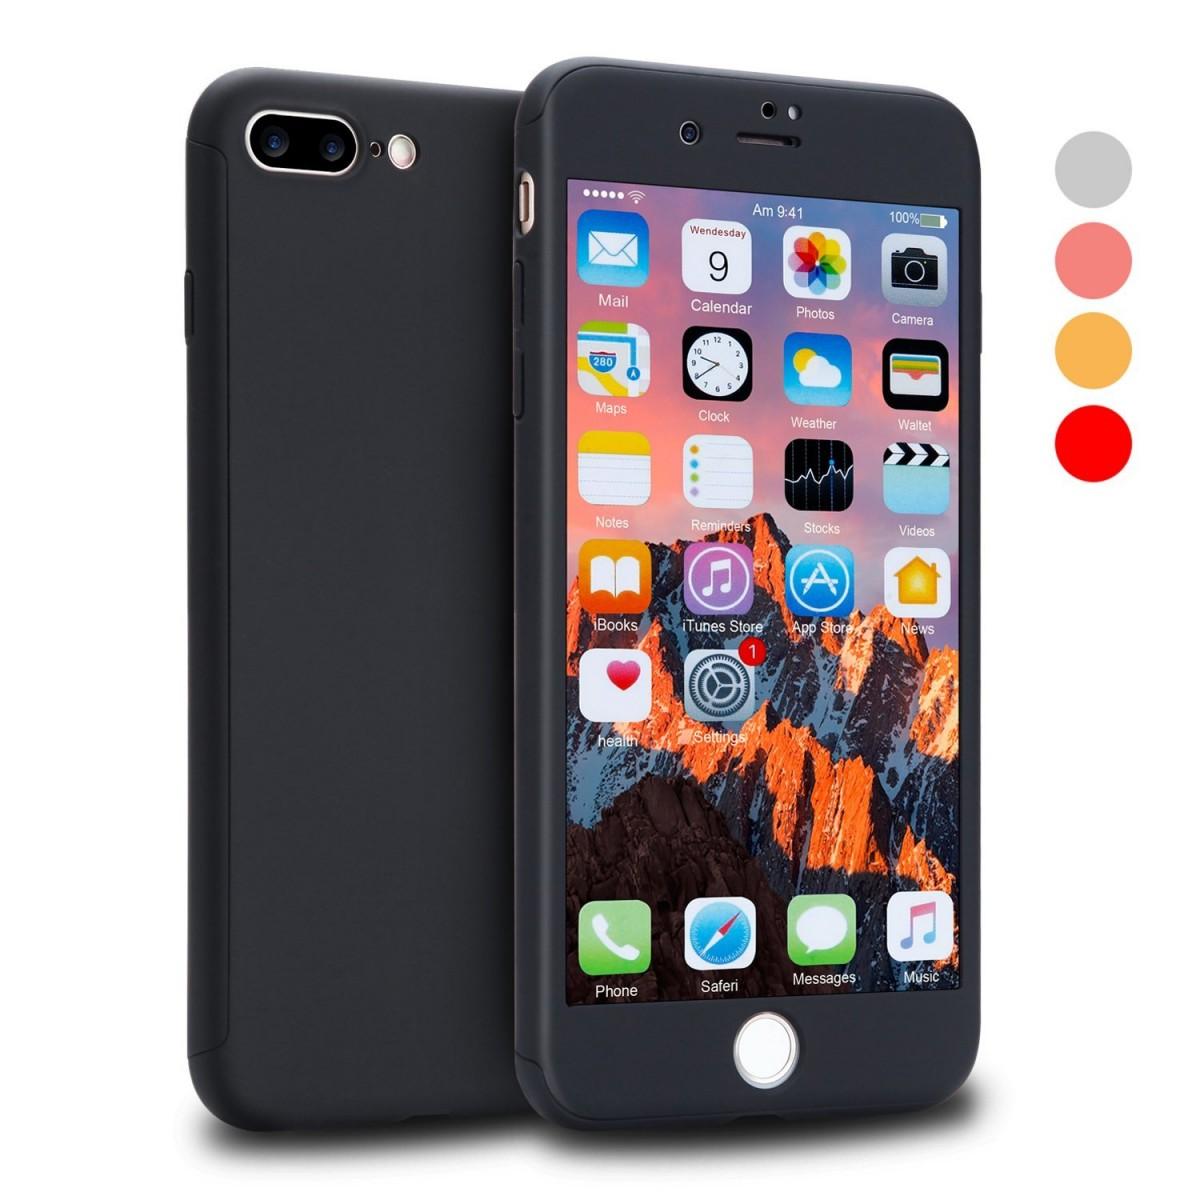 Pouzdro Beweare 360 oboustranné iPhone 7 Plus   iPhone 8 Plus - černé 3f47dd26eef